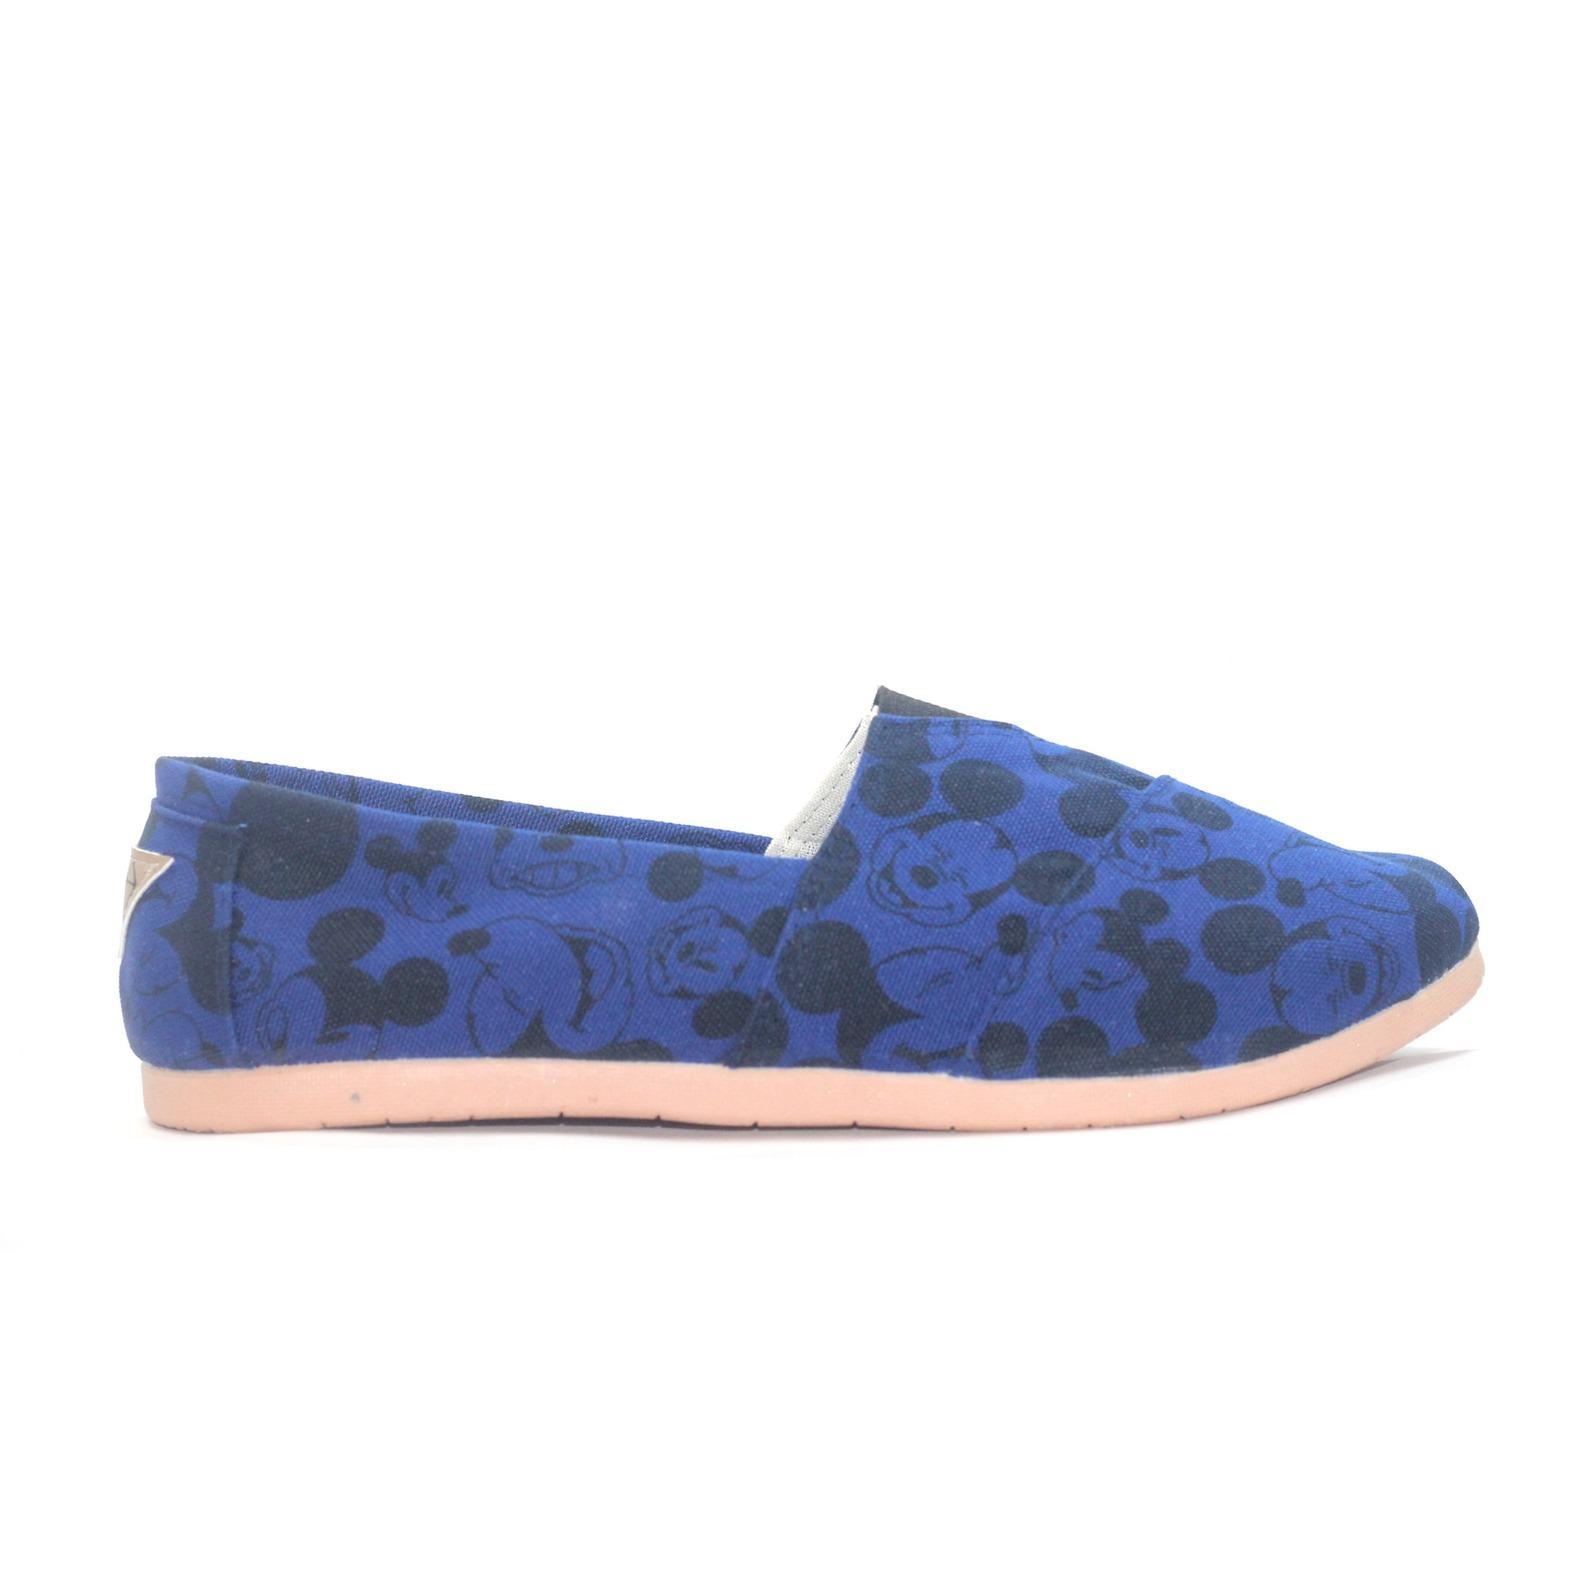 JRC sepatu wanita flatshoes slipon disney mickey model toms / wakai